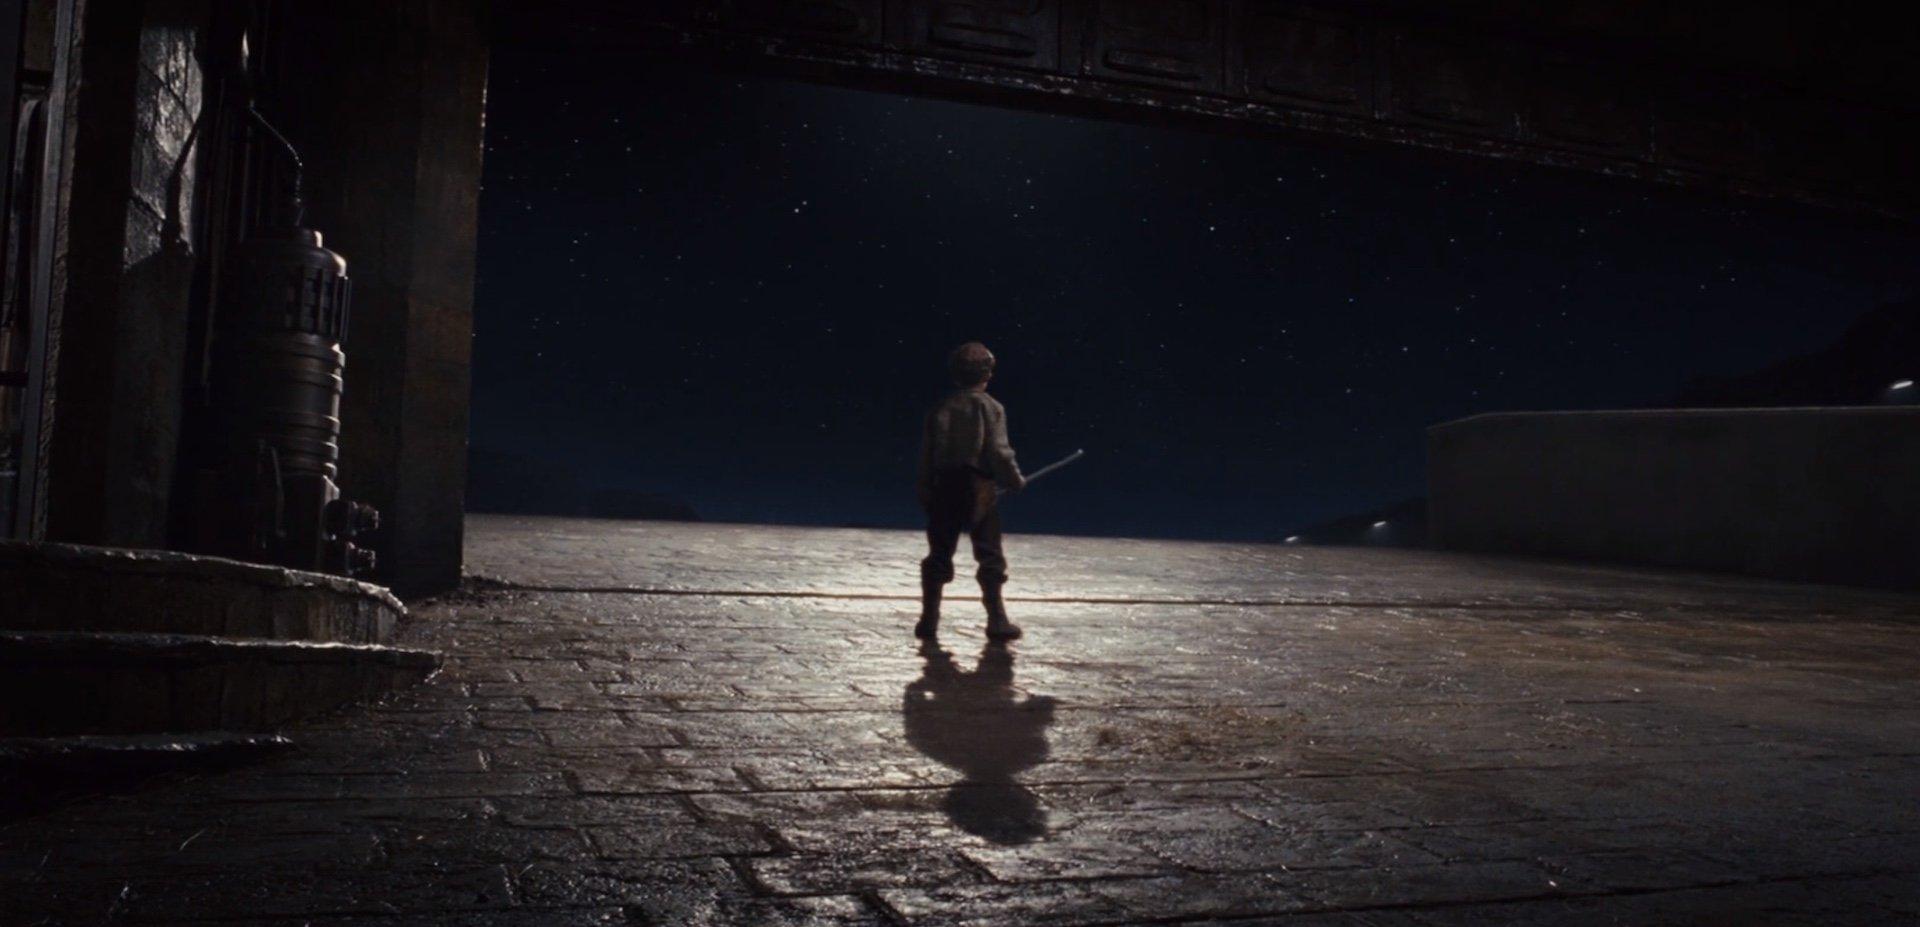 Gli ultimi Jedi Broom Boy